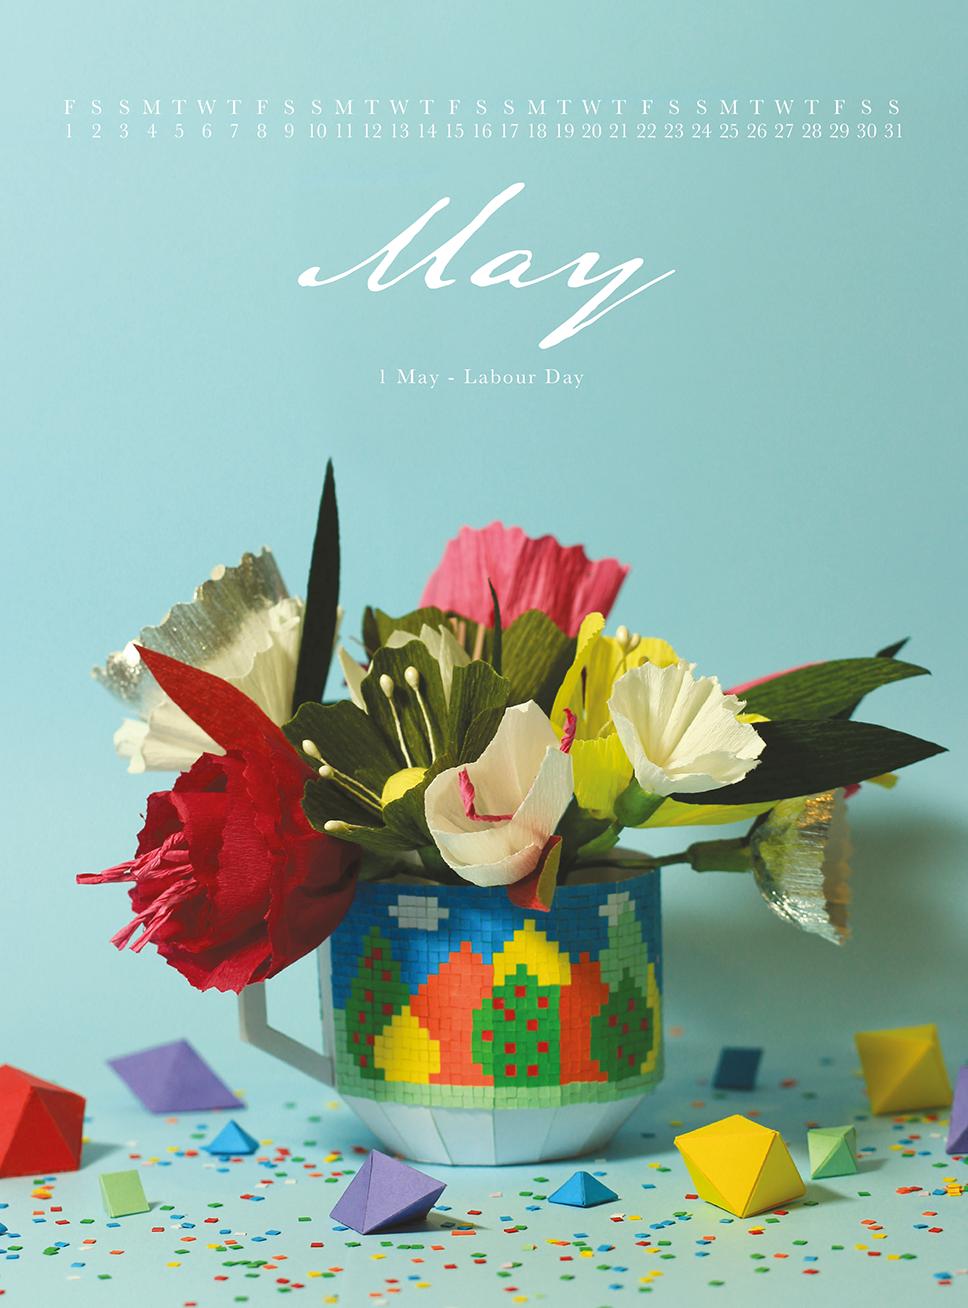 Website_Pencilled_2015Calendar_May